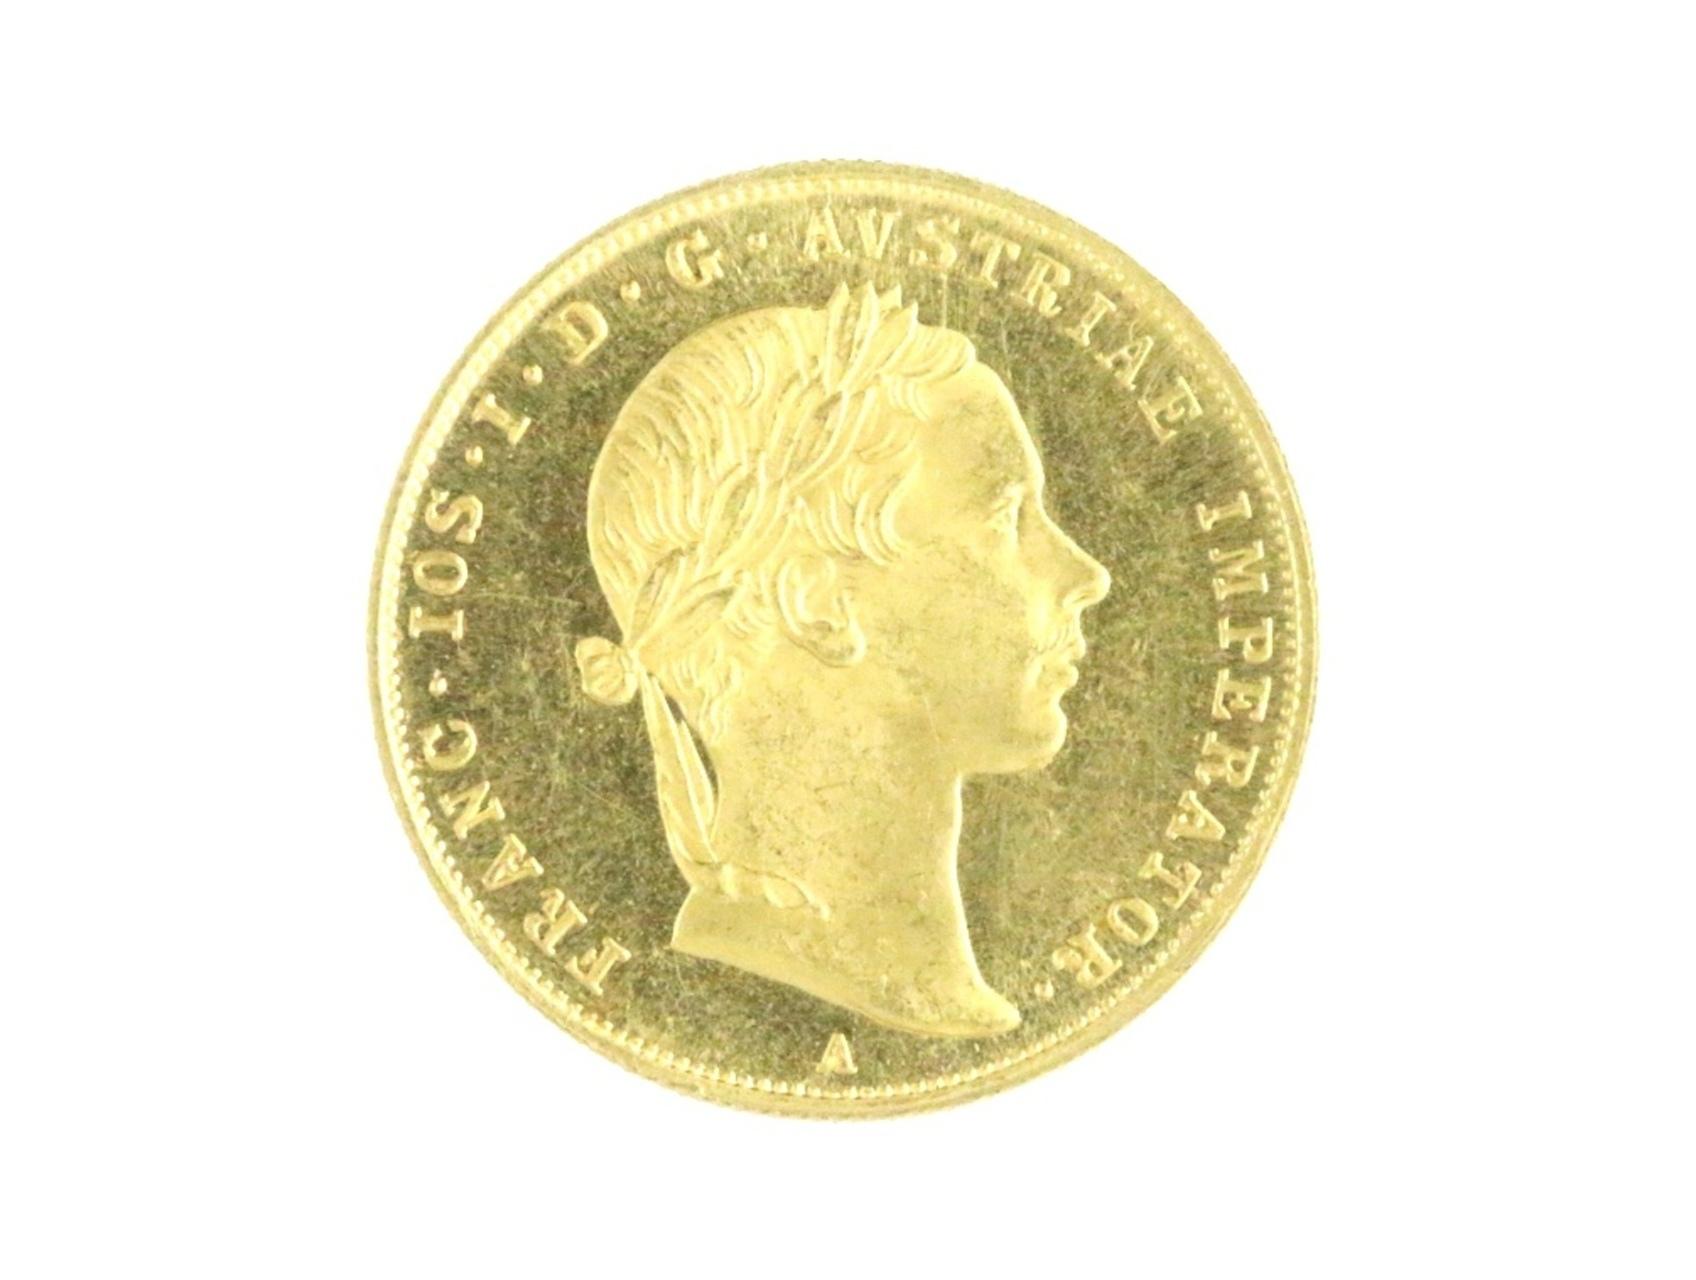 František Josef I. 1848-1916 - Dukát 1858 A, N106